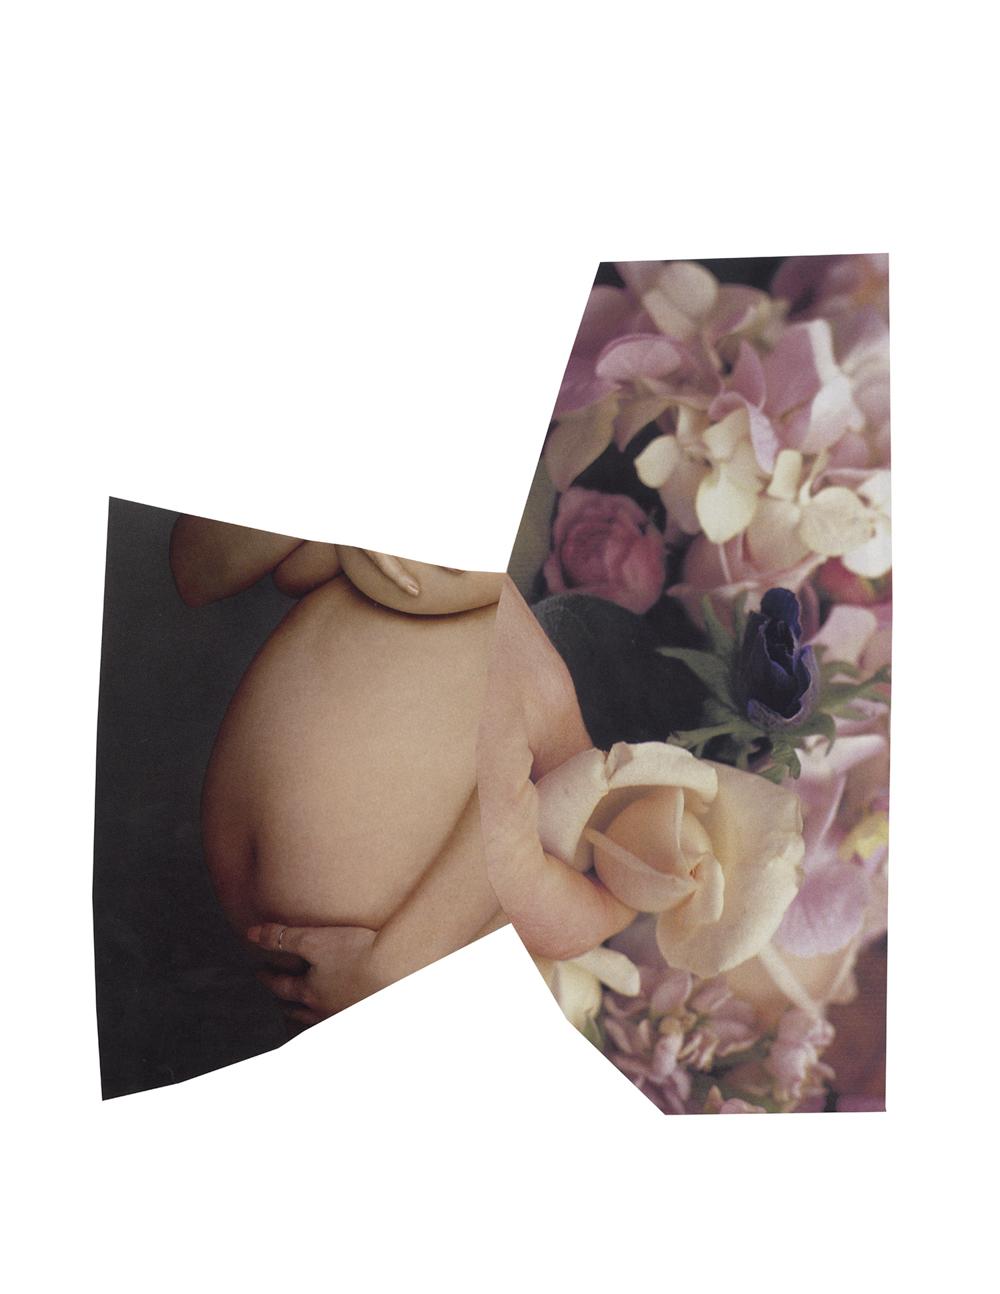 Nurturing softness / I want a new kind of sugar in my bones.  Day 59 of 100 - 1/31/17   Statement + Info